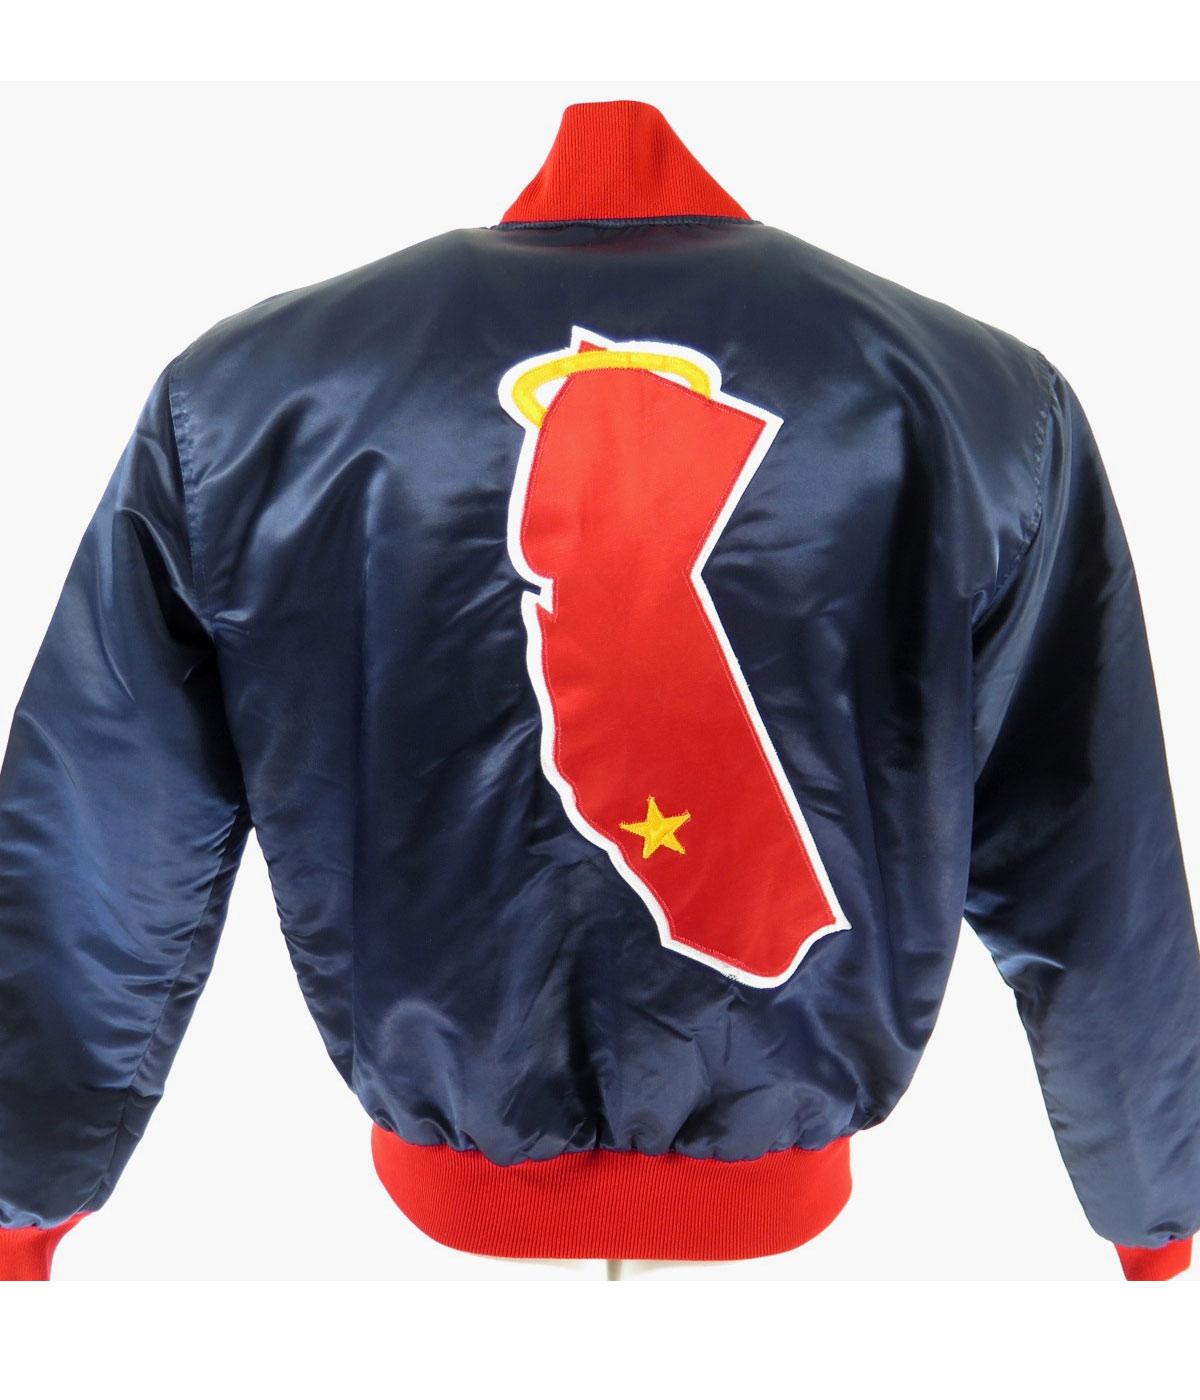 80s-california-anaheim-angels-jacket